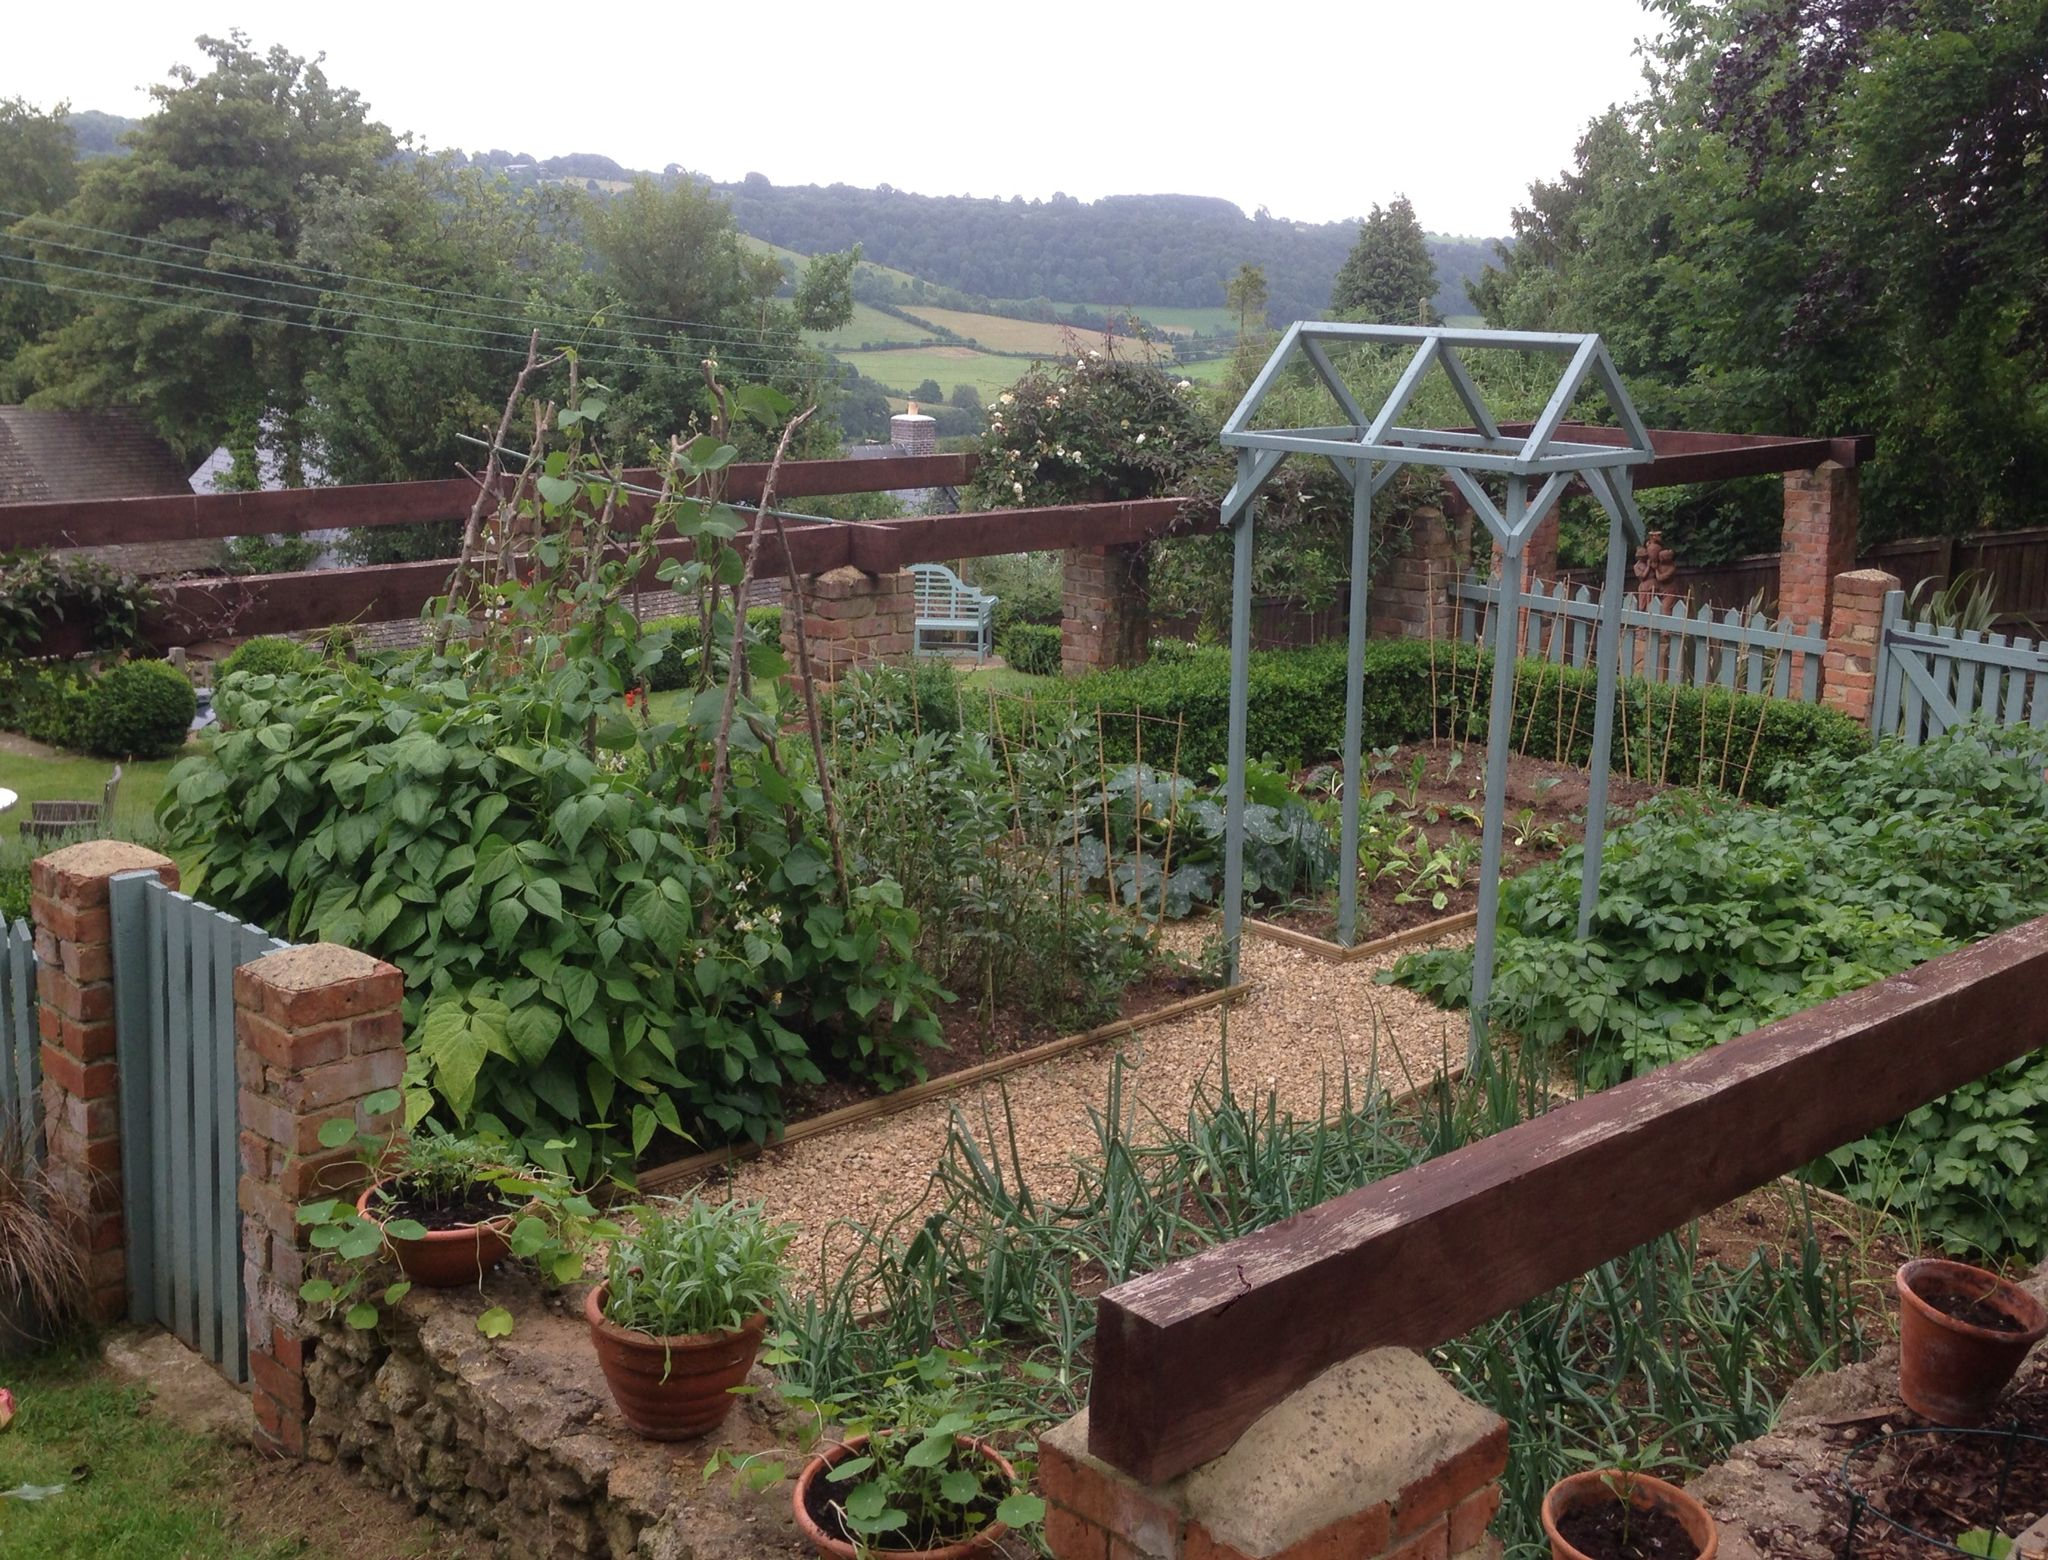 beautiful views across the slad valley from little orchard s kitchen garden garden visits on kitchen garden id=38539